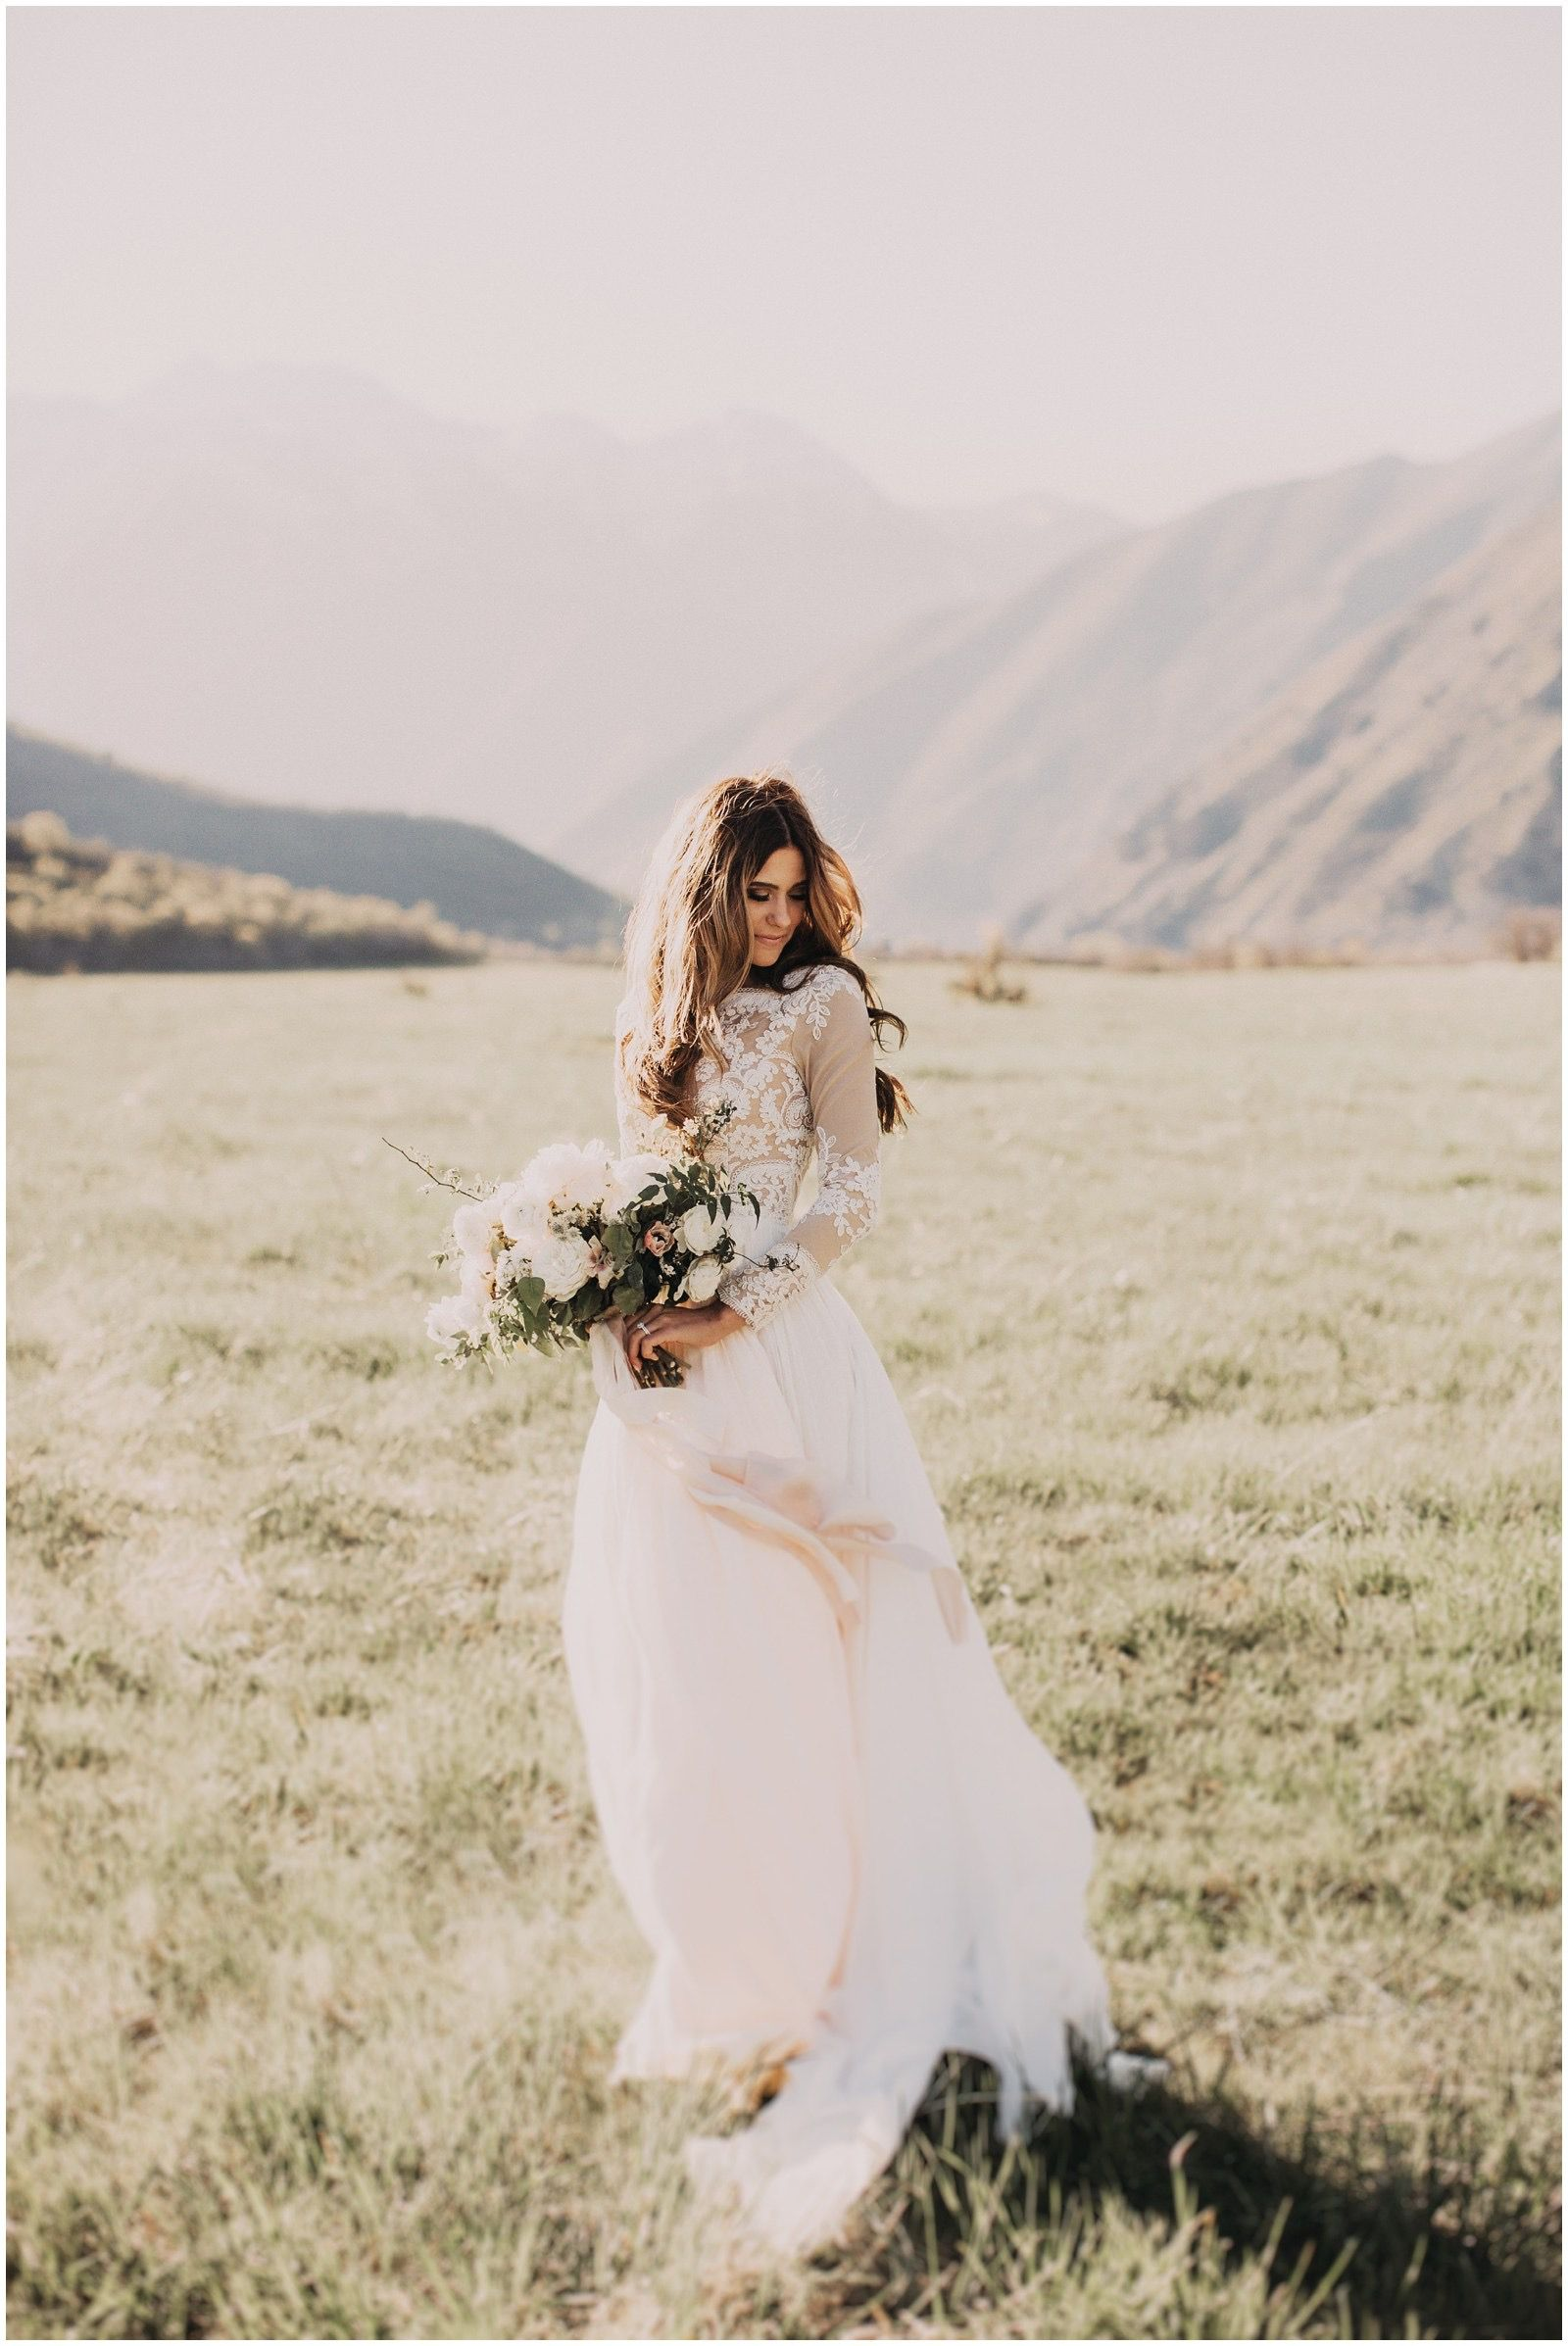 Pin by andi briones on u one day u pinterest wedding